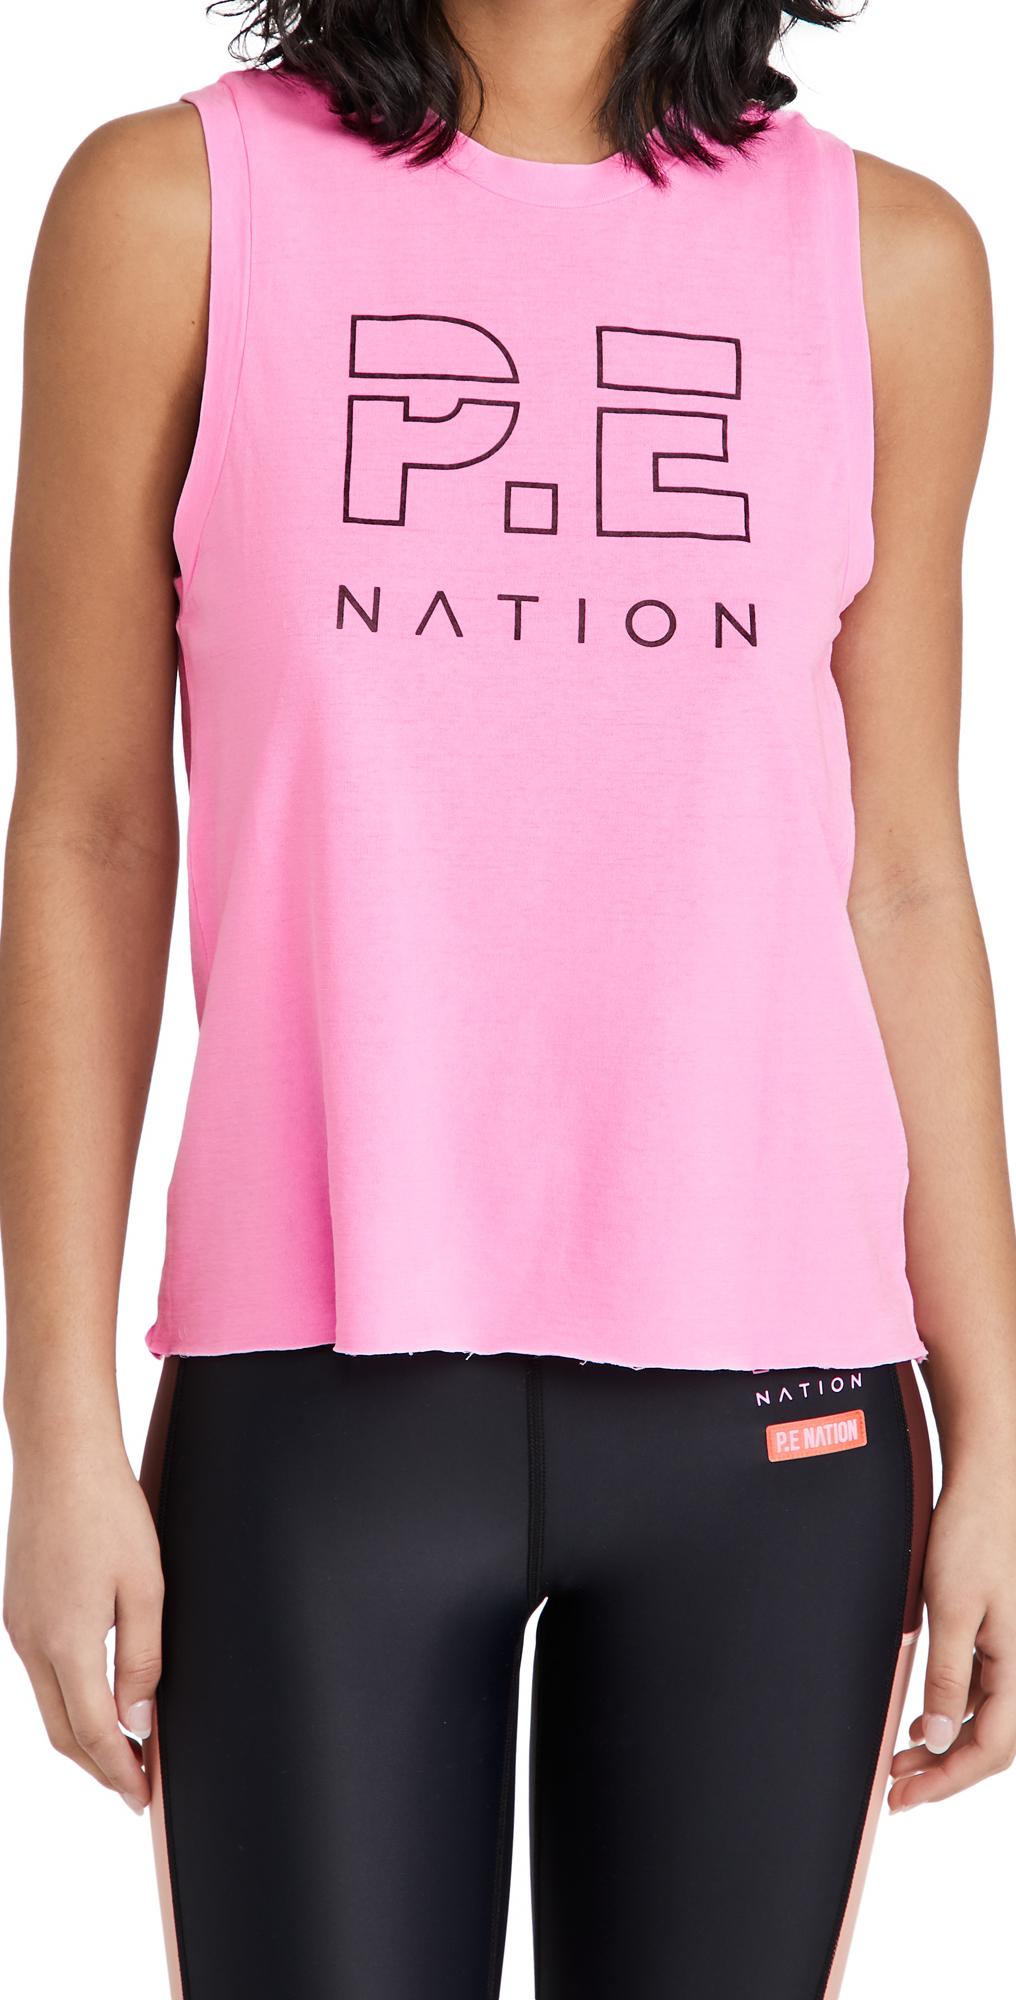 P.E NATION High Twist Shuffle Tank